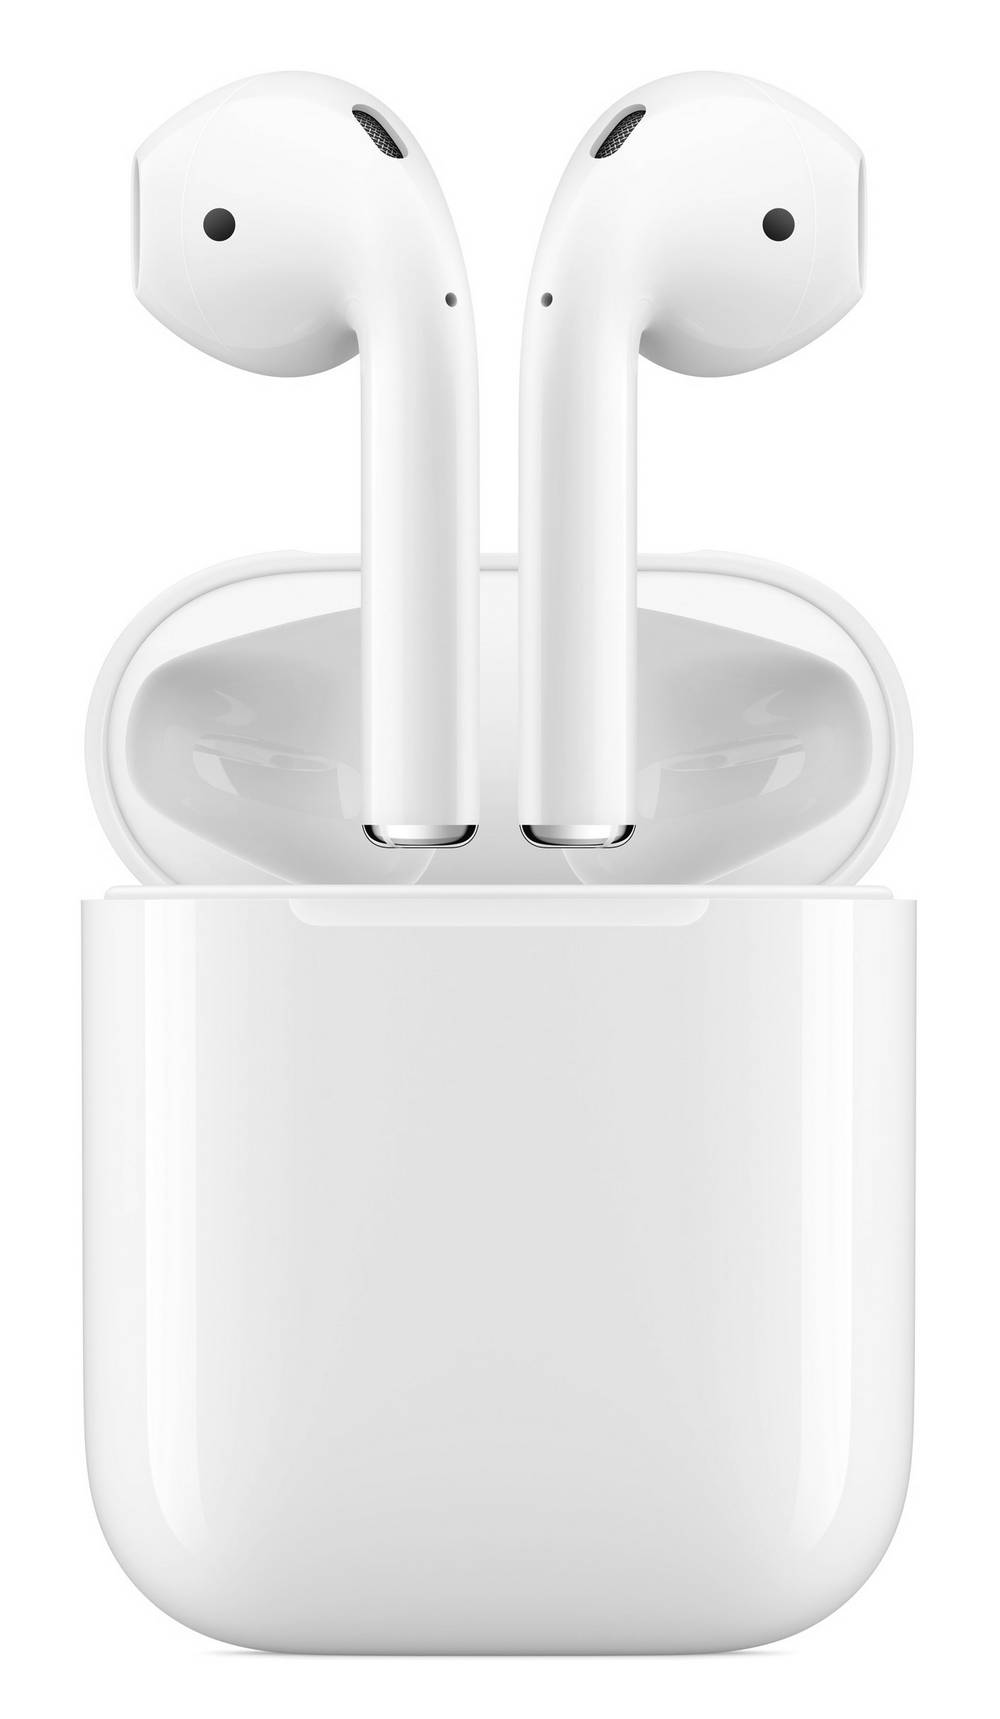 Hands Free Stereo Apple AirPods Wireless MMEF2ZM/A Original